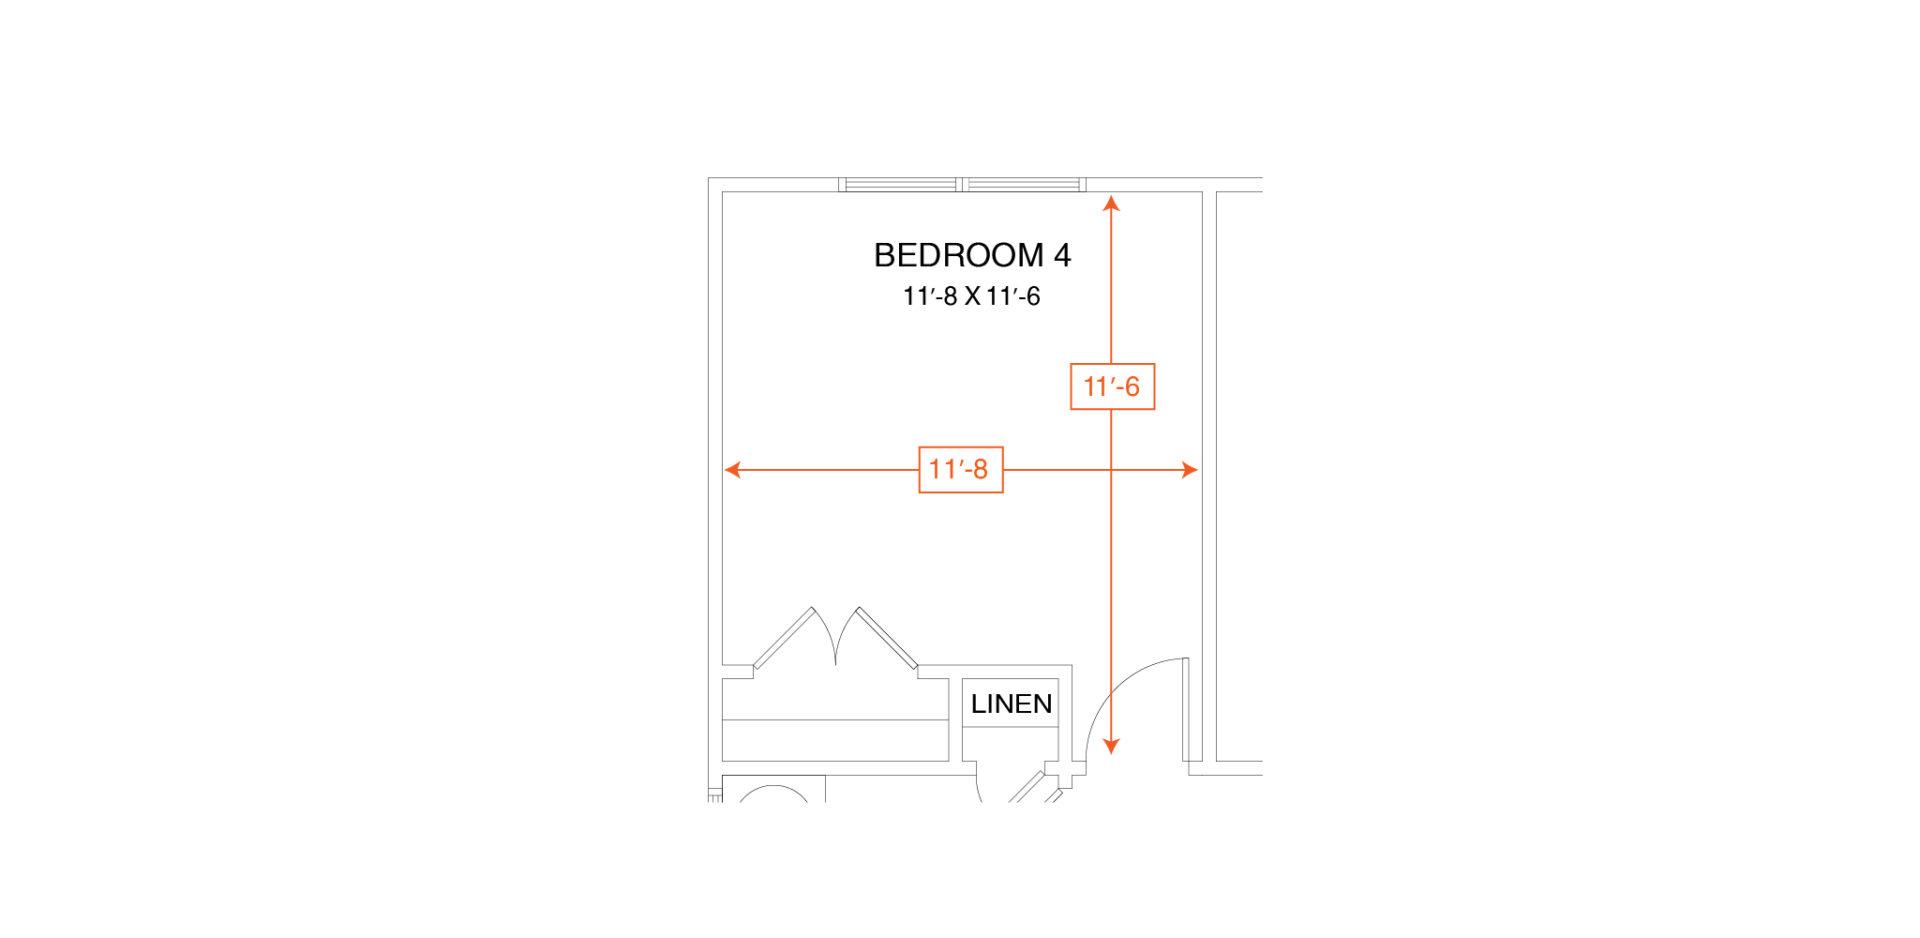 How to Read Your Home's Floor Planimage_block-block_5ec84b864af5a